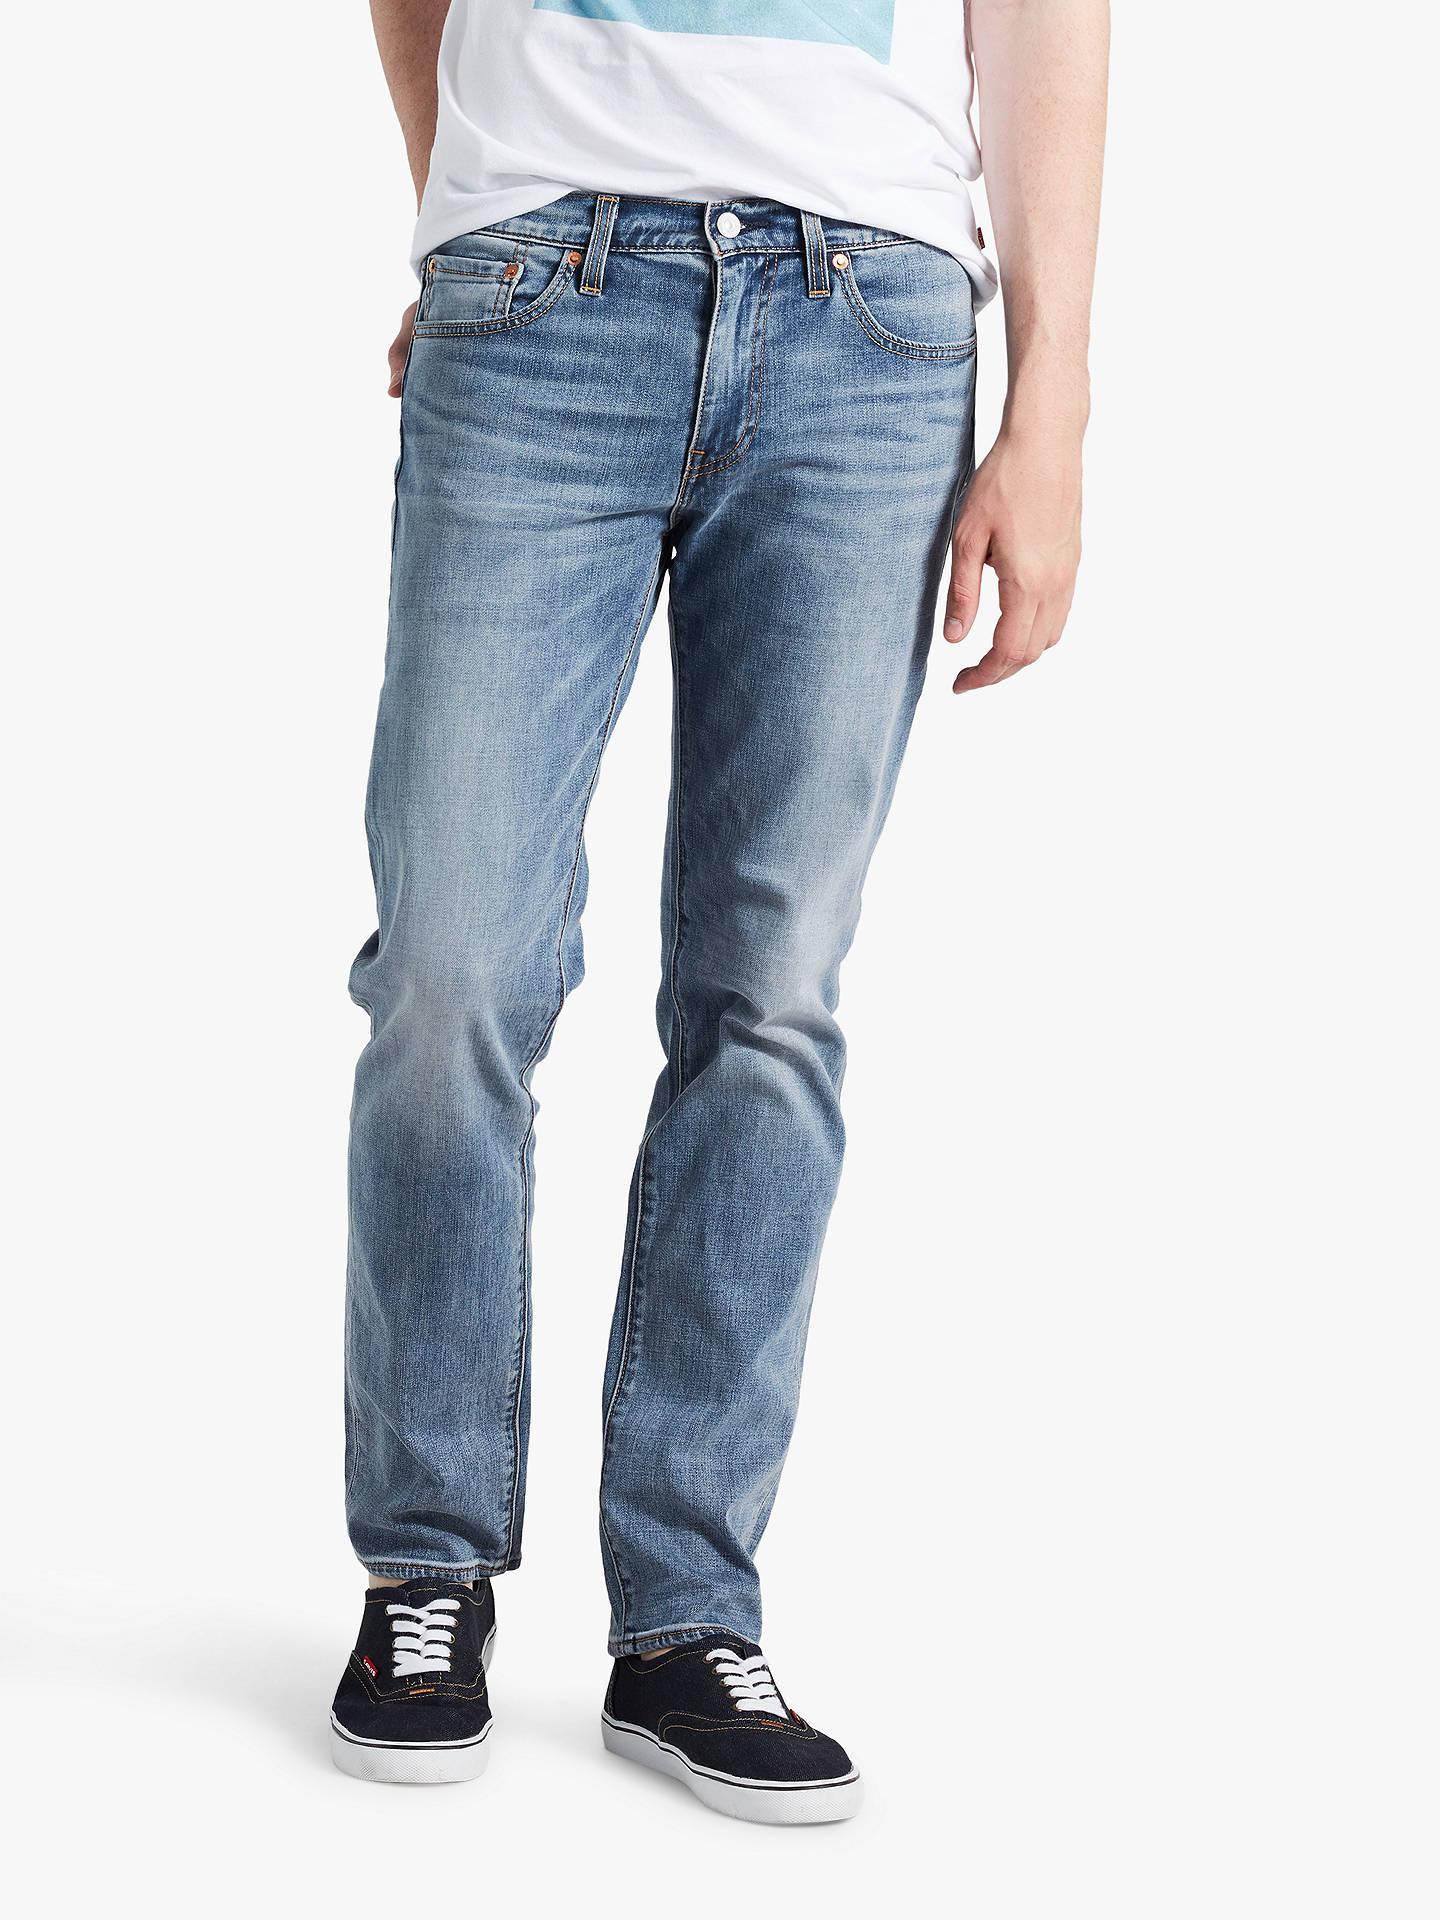 Levi S 511 Slim Fit Jeans Aegean Adapt At John Lewis